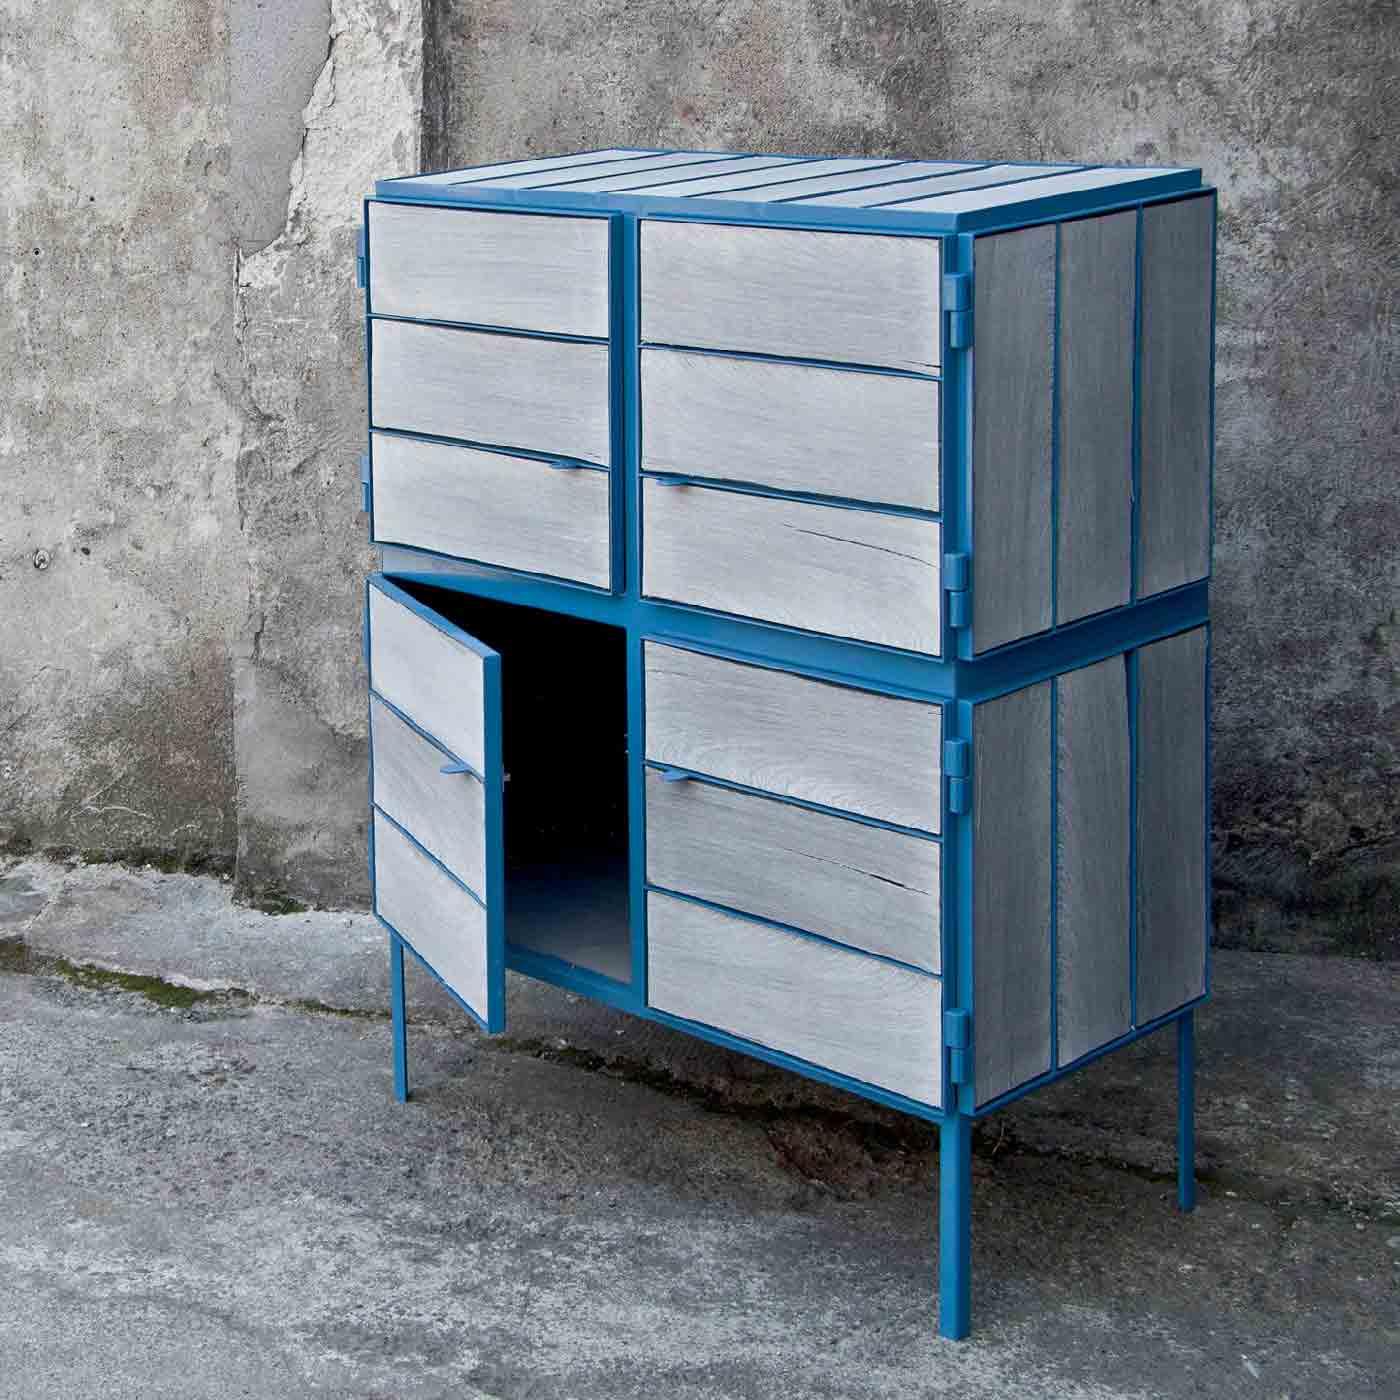 NLD-Breg-Hanssen-framed-cabinet